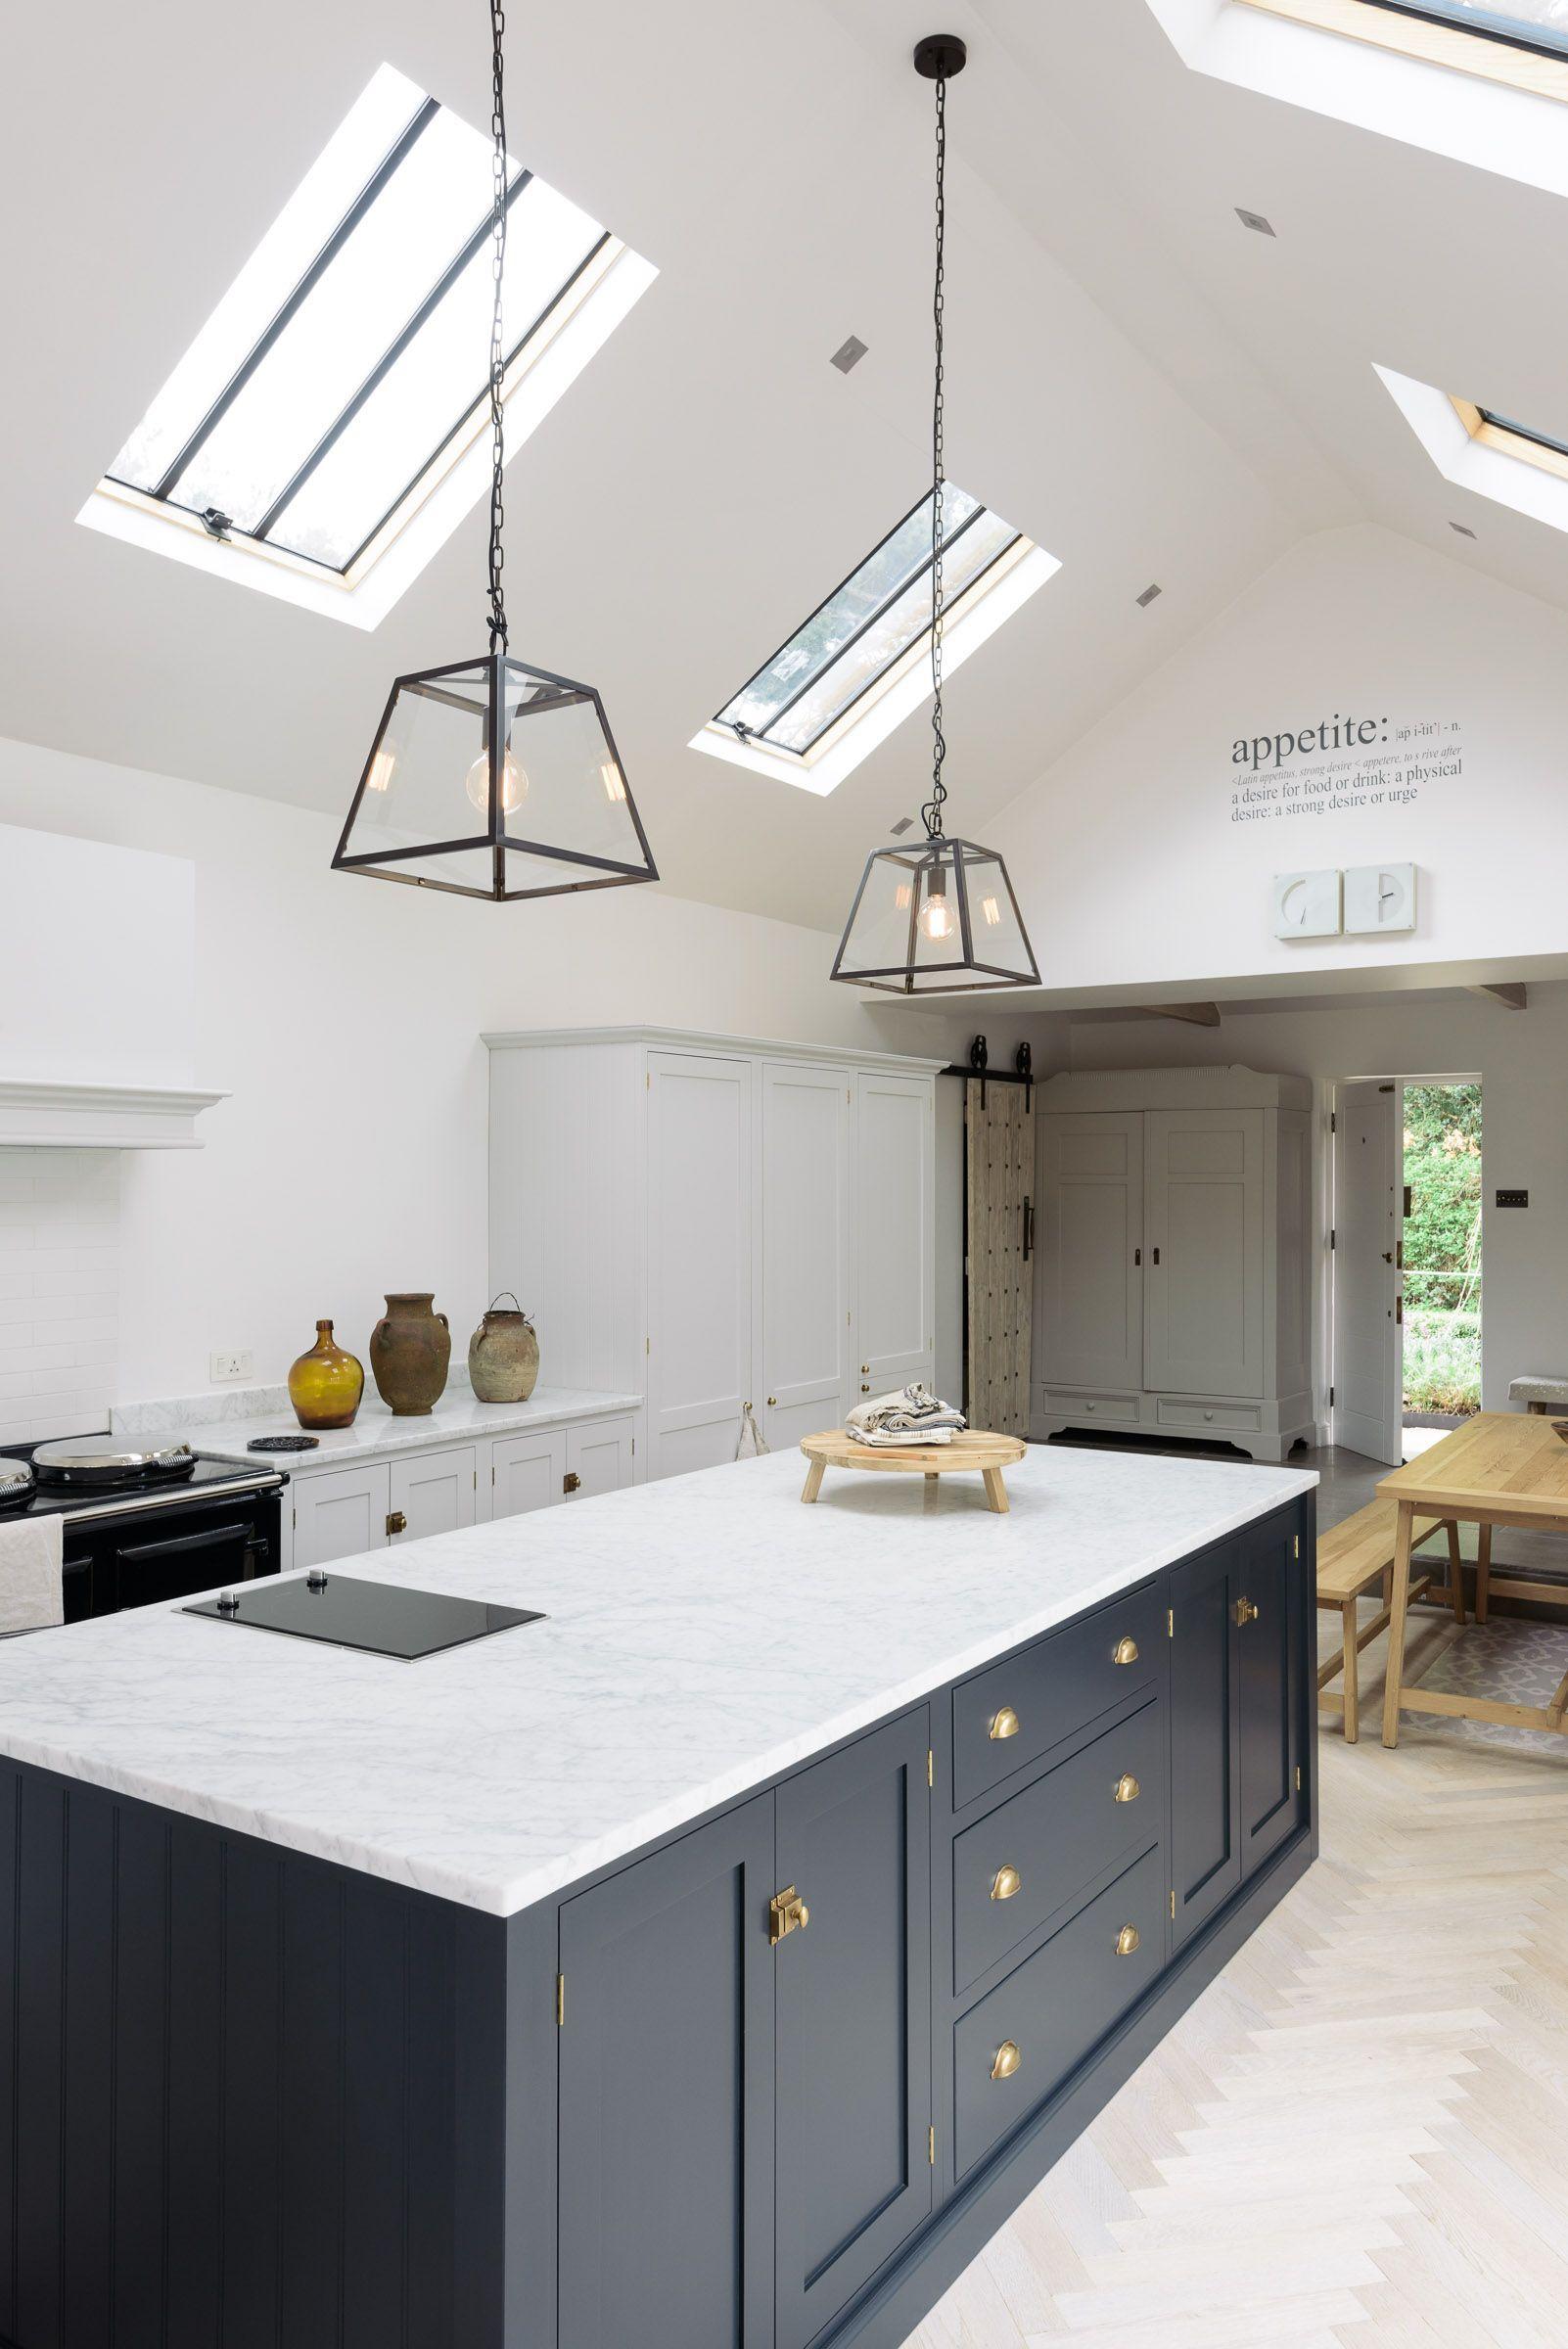 Lofty Modern Farmhouse Kitchen With Shaker Cabinets U0026 Skylights {Decor  Inspiration}   Hello Lovely